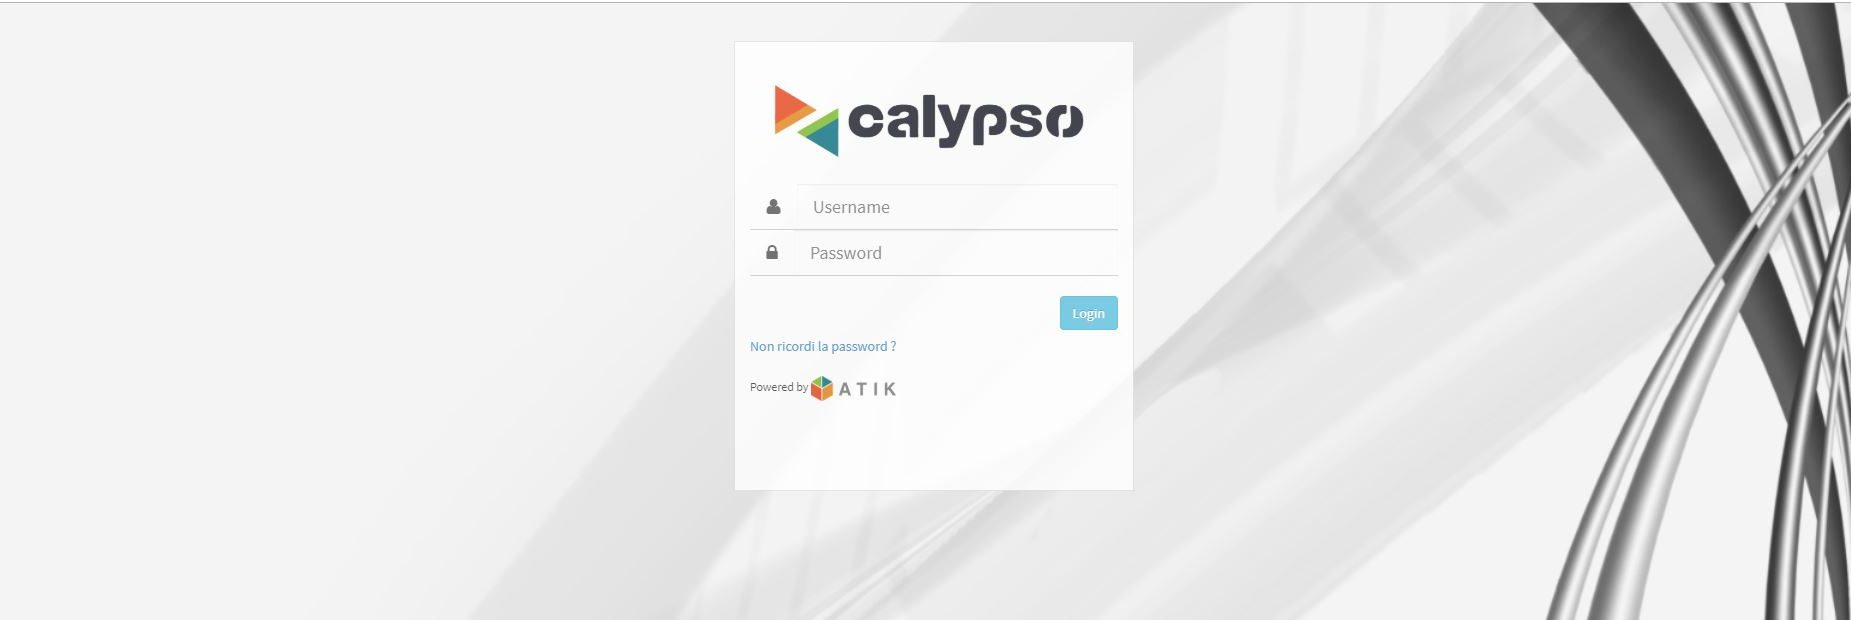 Software Gestionale Calypso